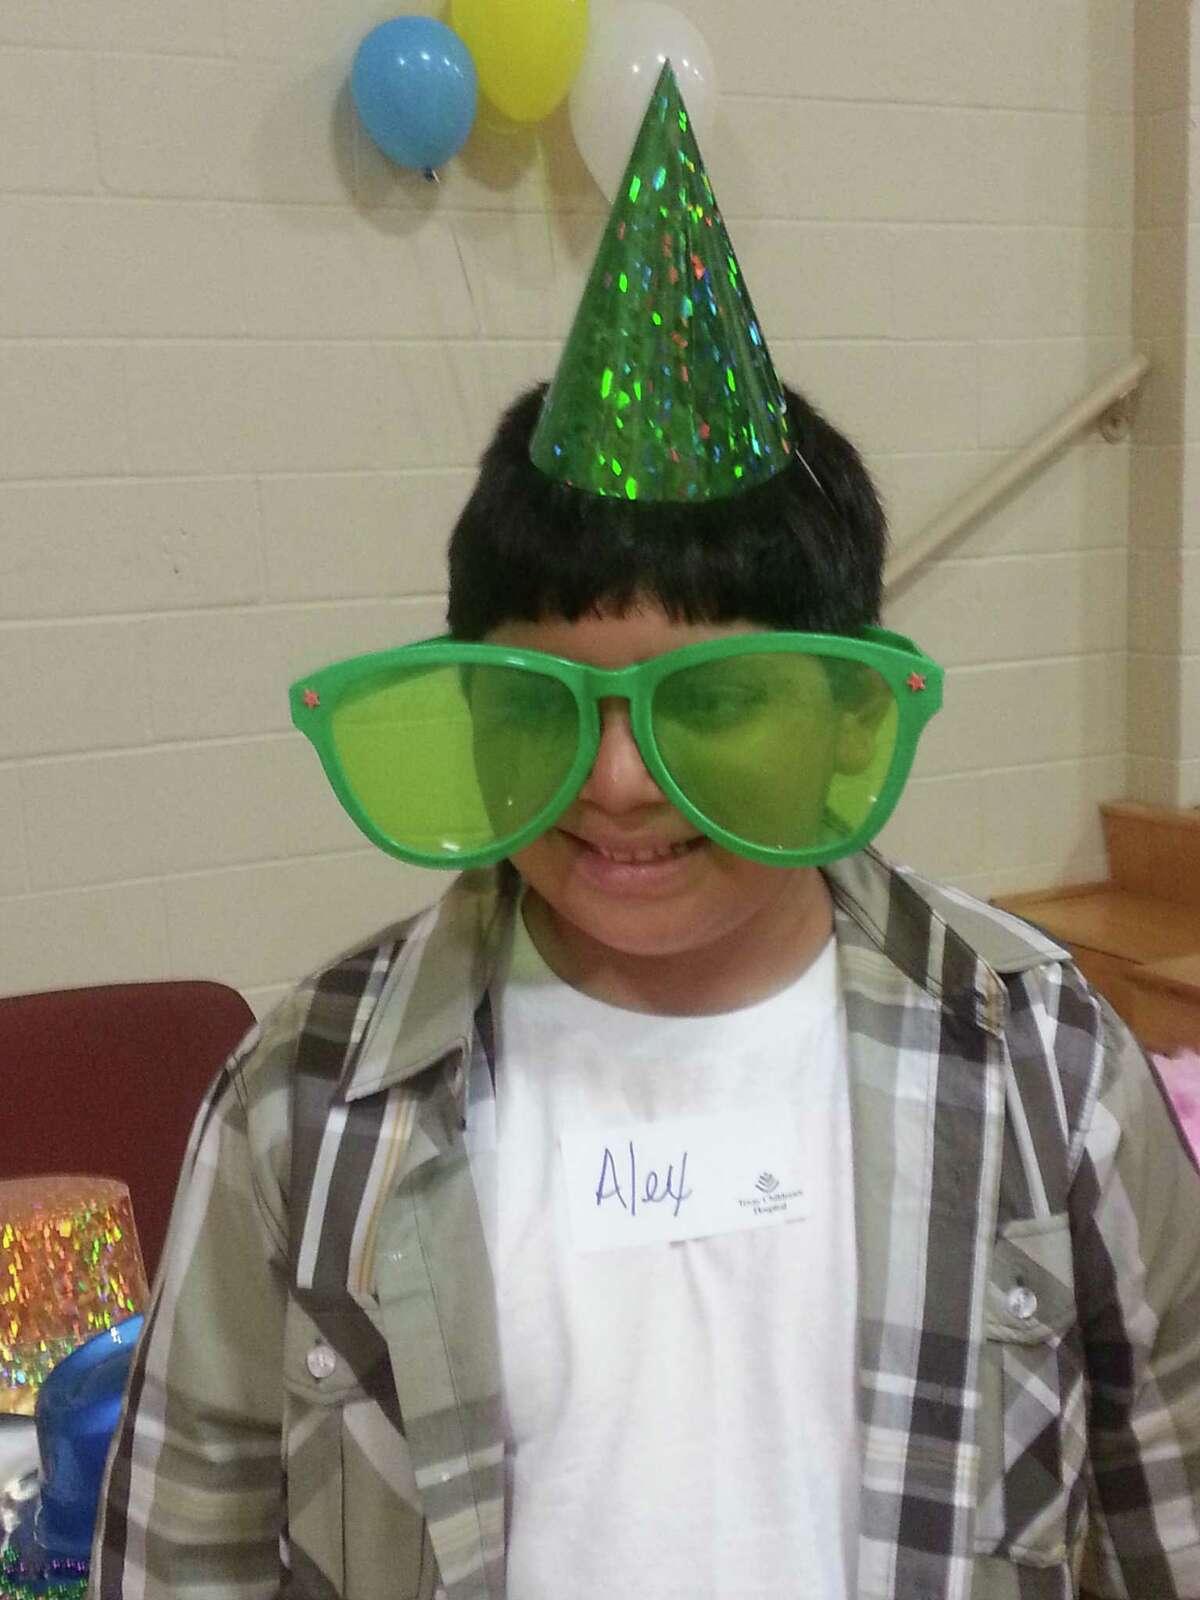 Texas Children's Hospital rehab outpatient Alex Ramirez enjoyed games and other activities at a recent reunion for former Inpatient Rehabilitation Unit patients.